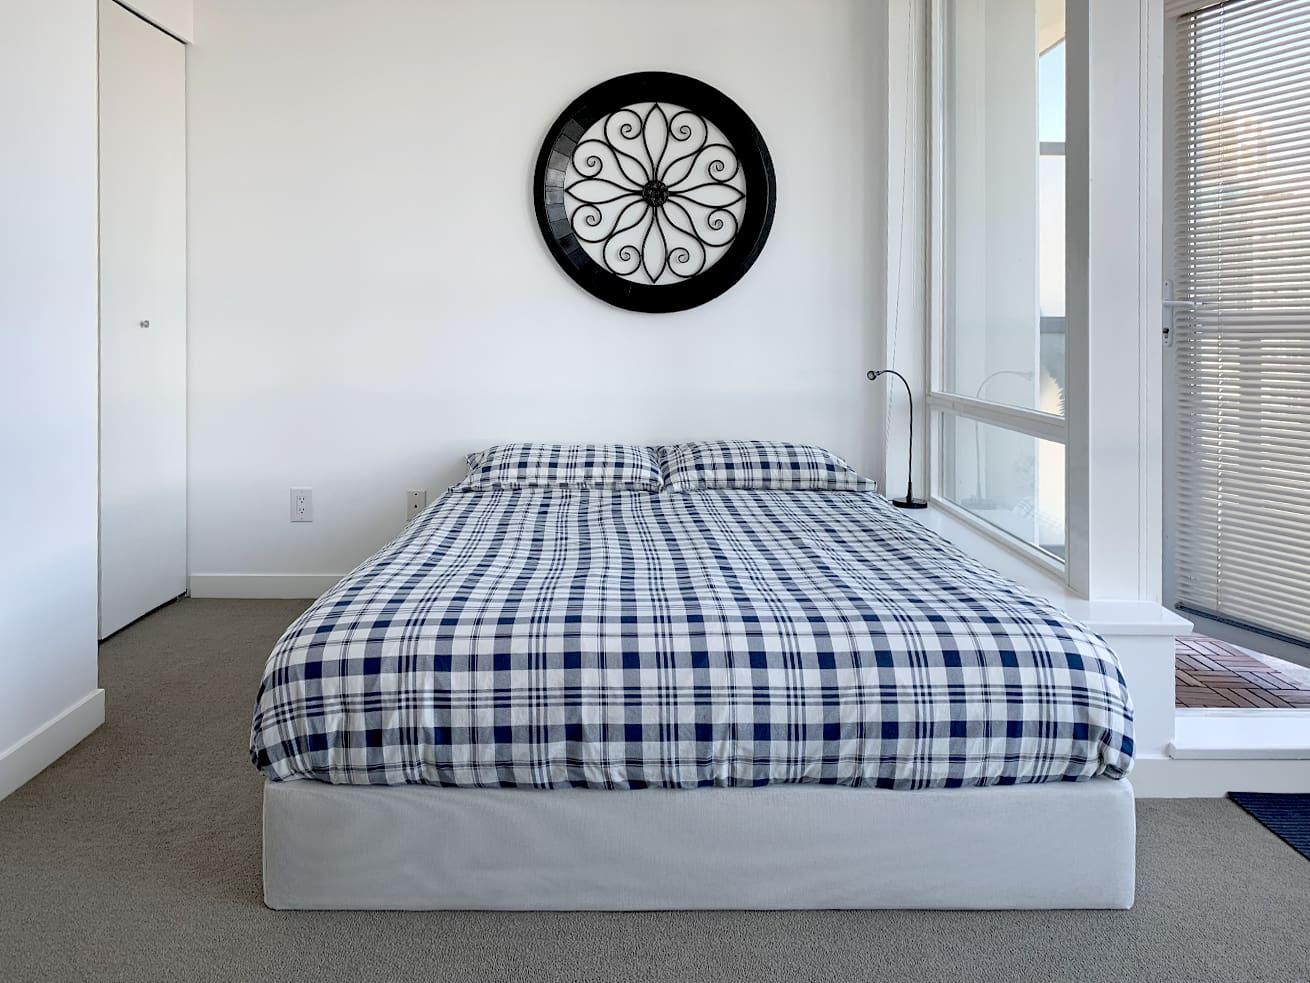 Vancouver apartment rentals max studio den sleeping area